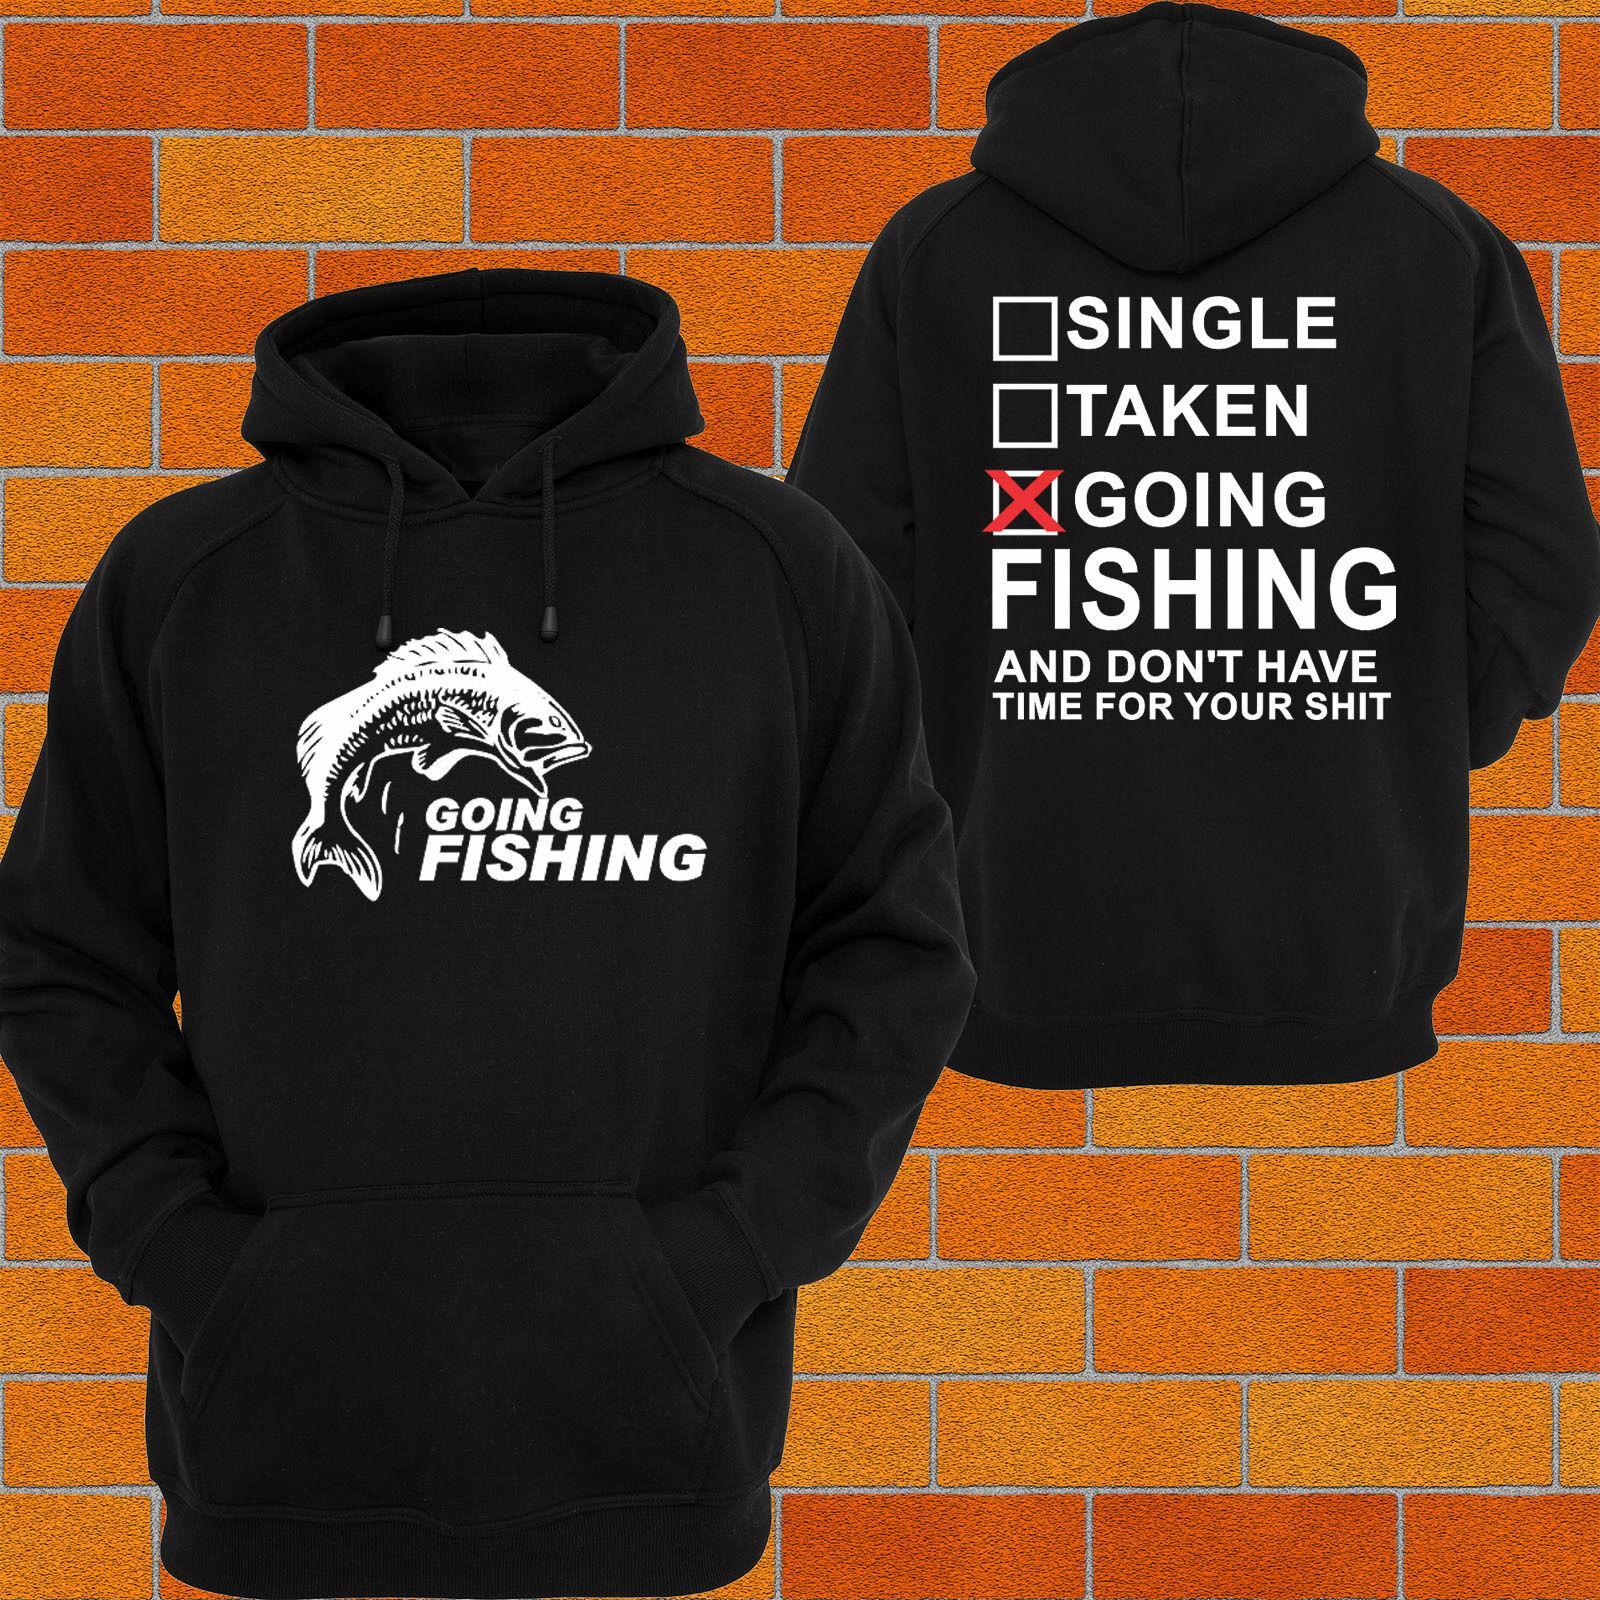 Herren Hoodie FISHING rod Lure Funny slogan Fish Gone Fishin Hoody Hooded Jumper